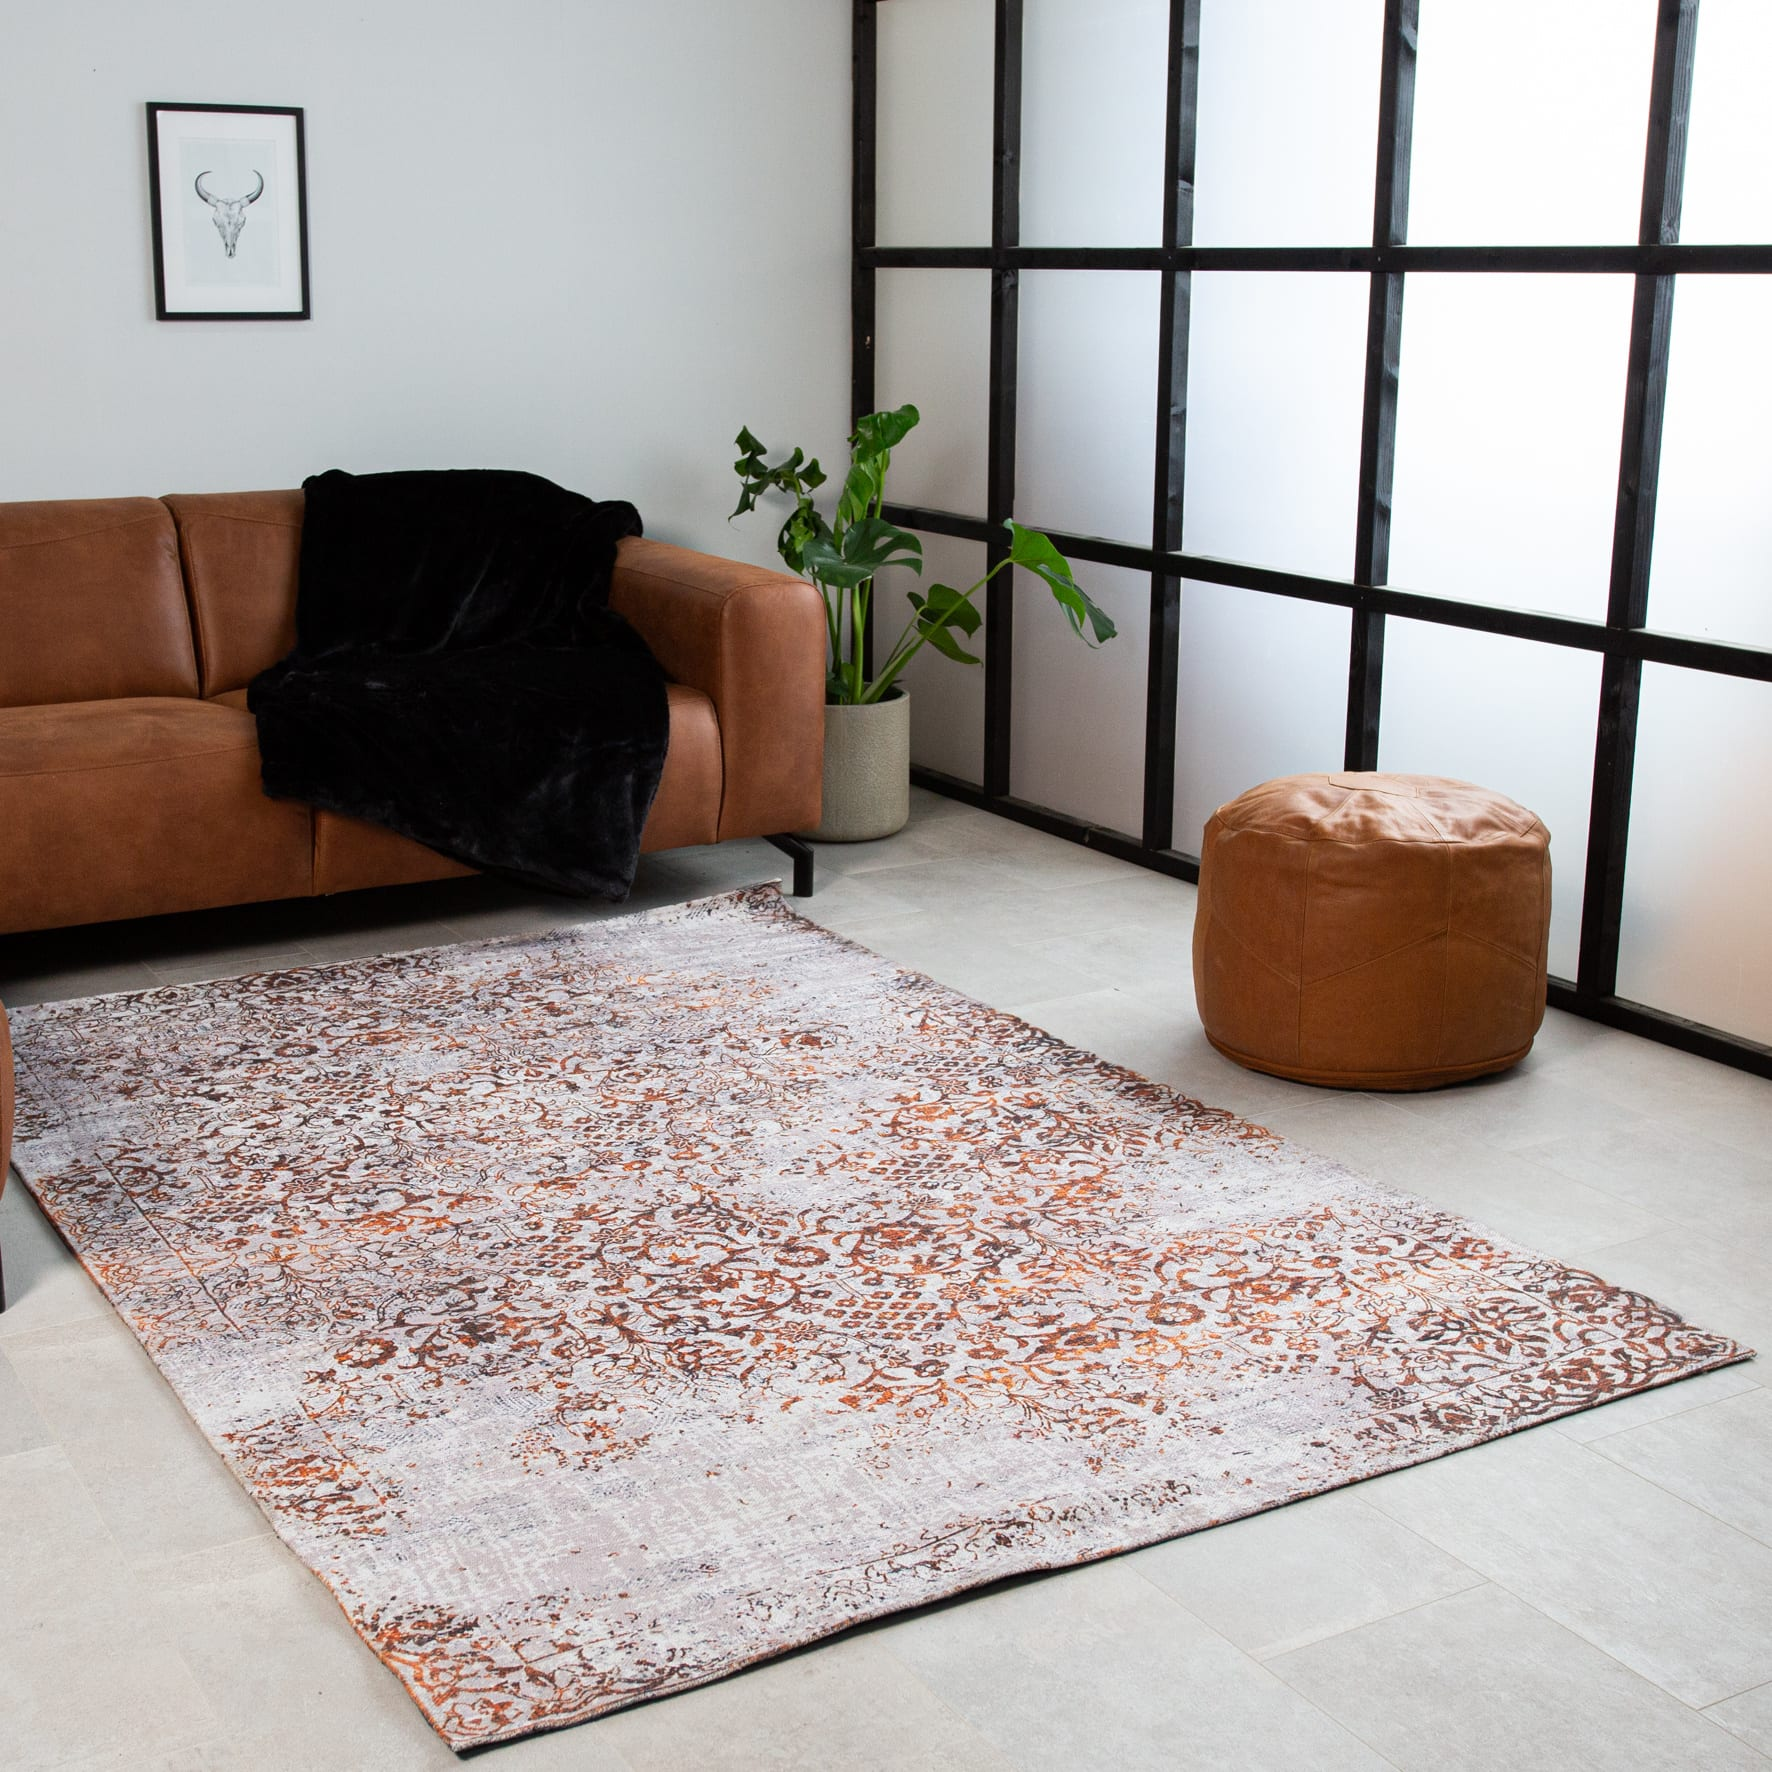 vloerkleed-oranje-wit-dylan-160x230-cm